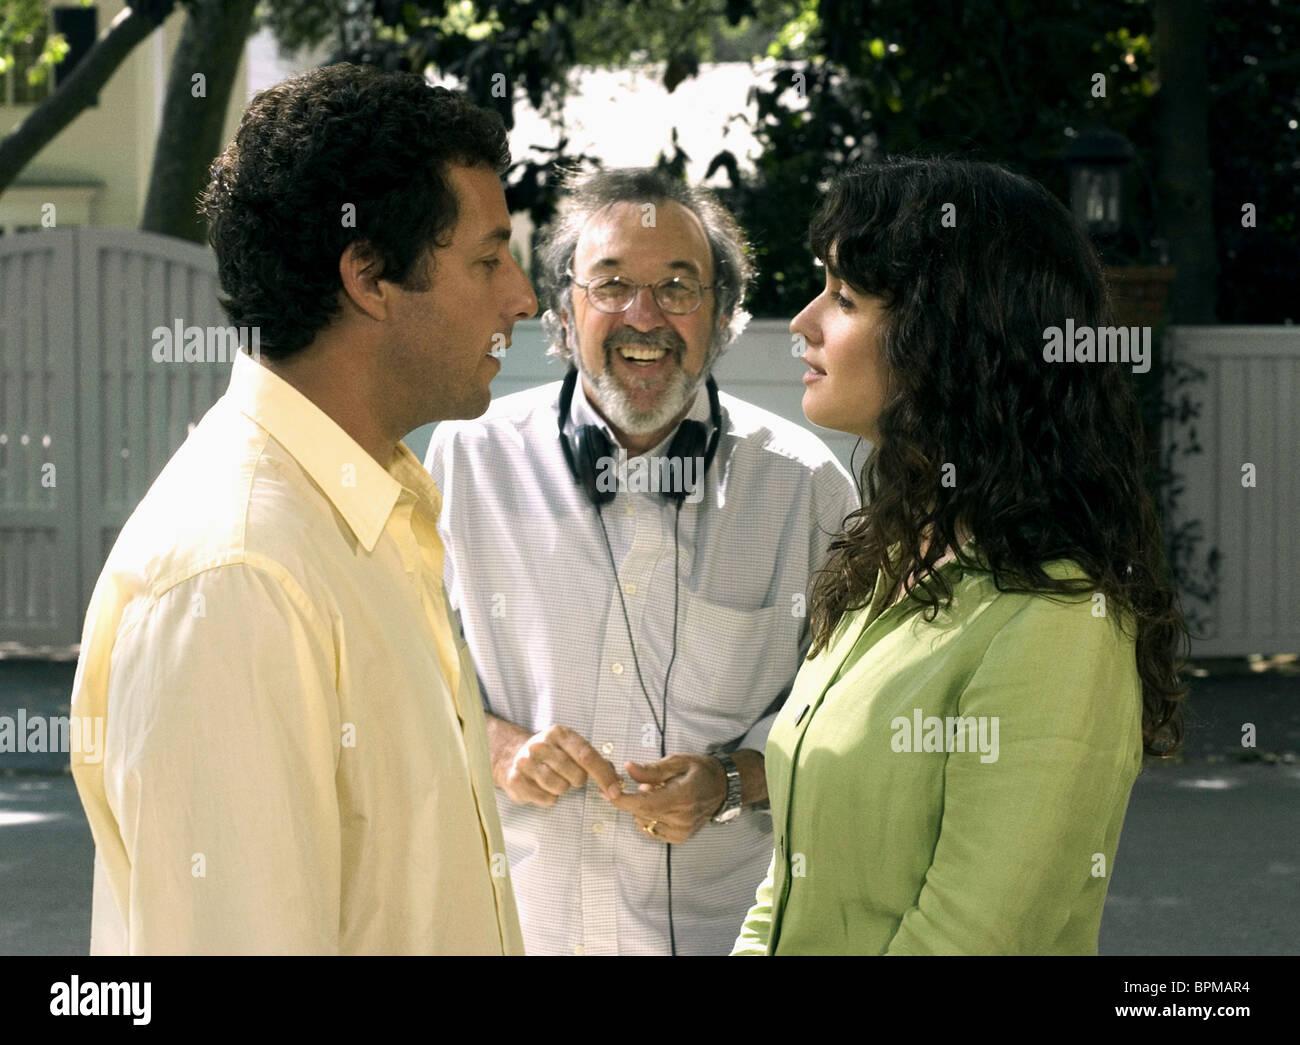 ADAM SANDLER JAMES L.BROOKS & PAZ VEGA SPANGLISH (2004) Photo Stock